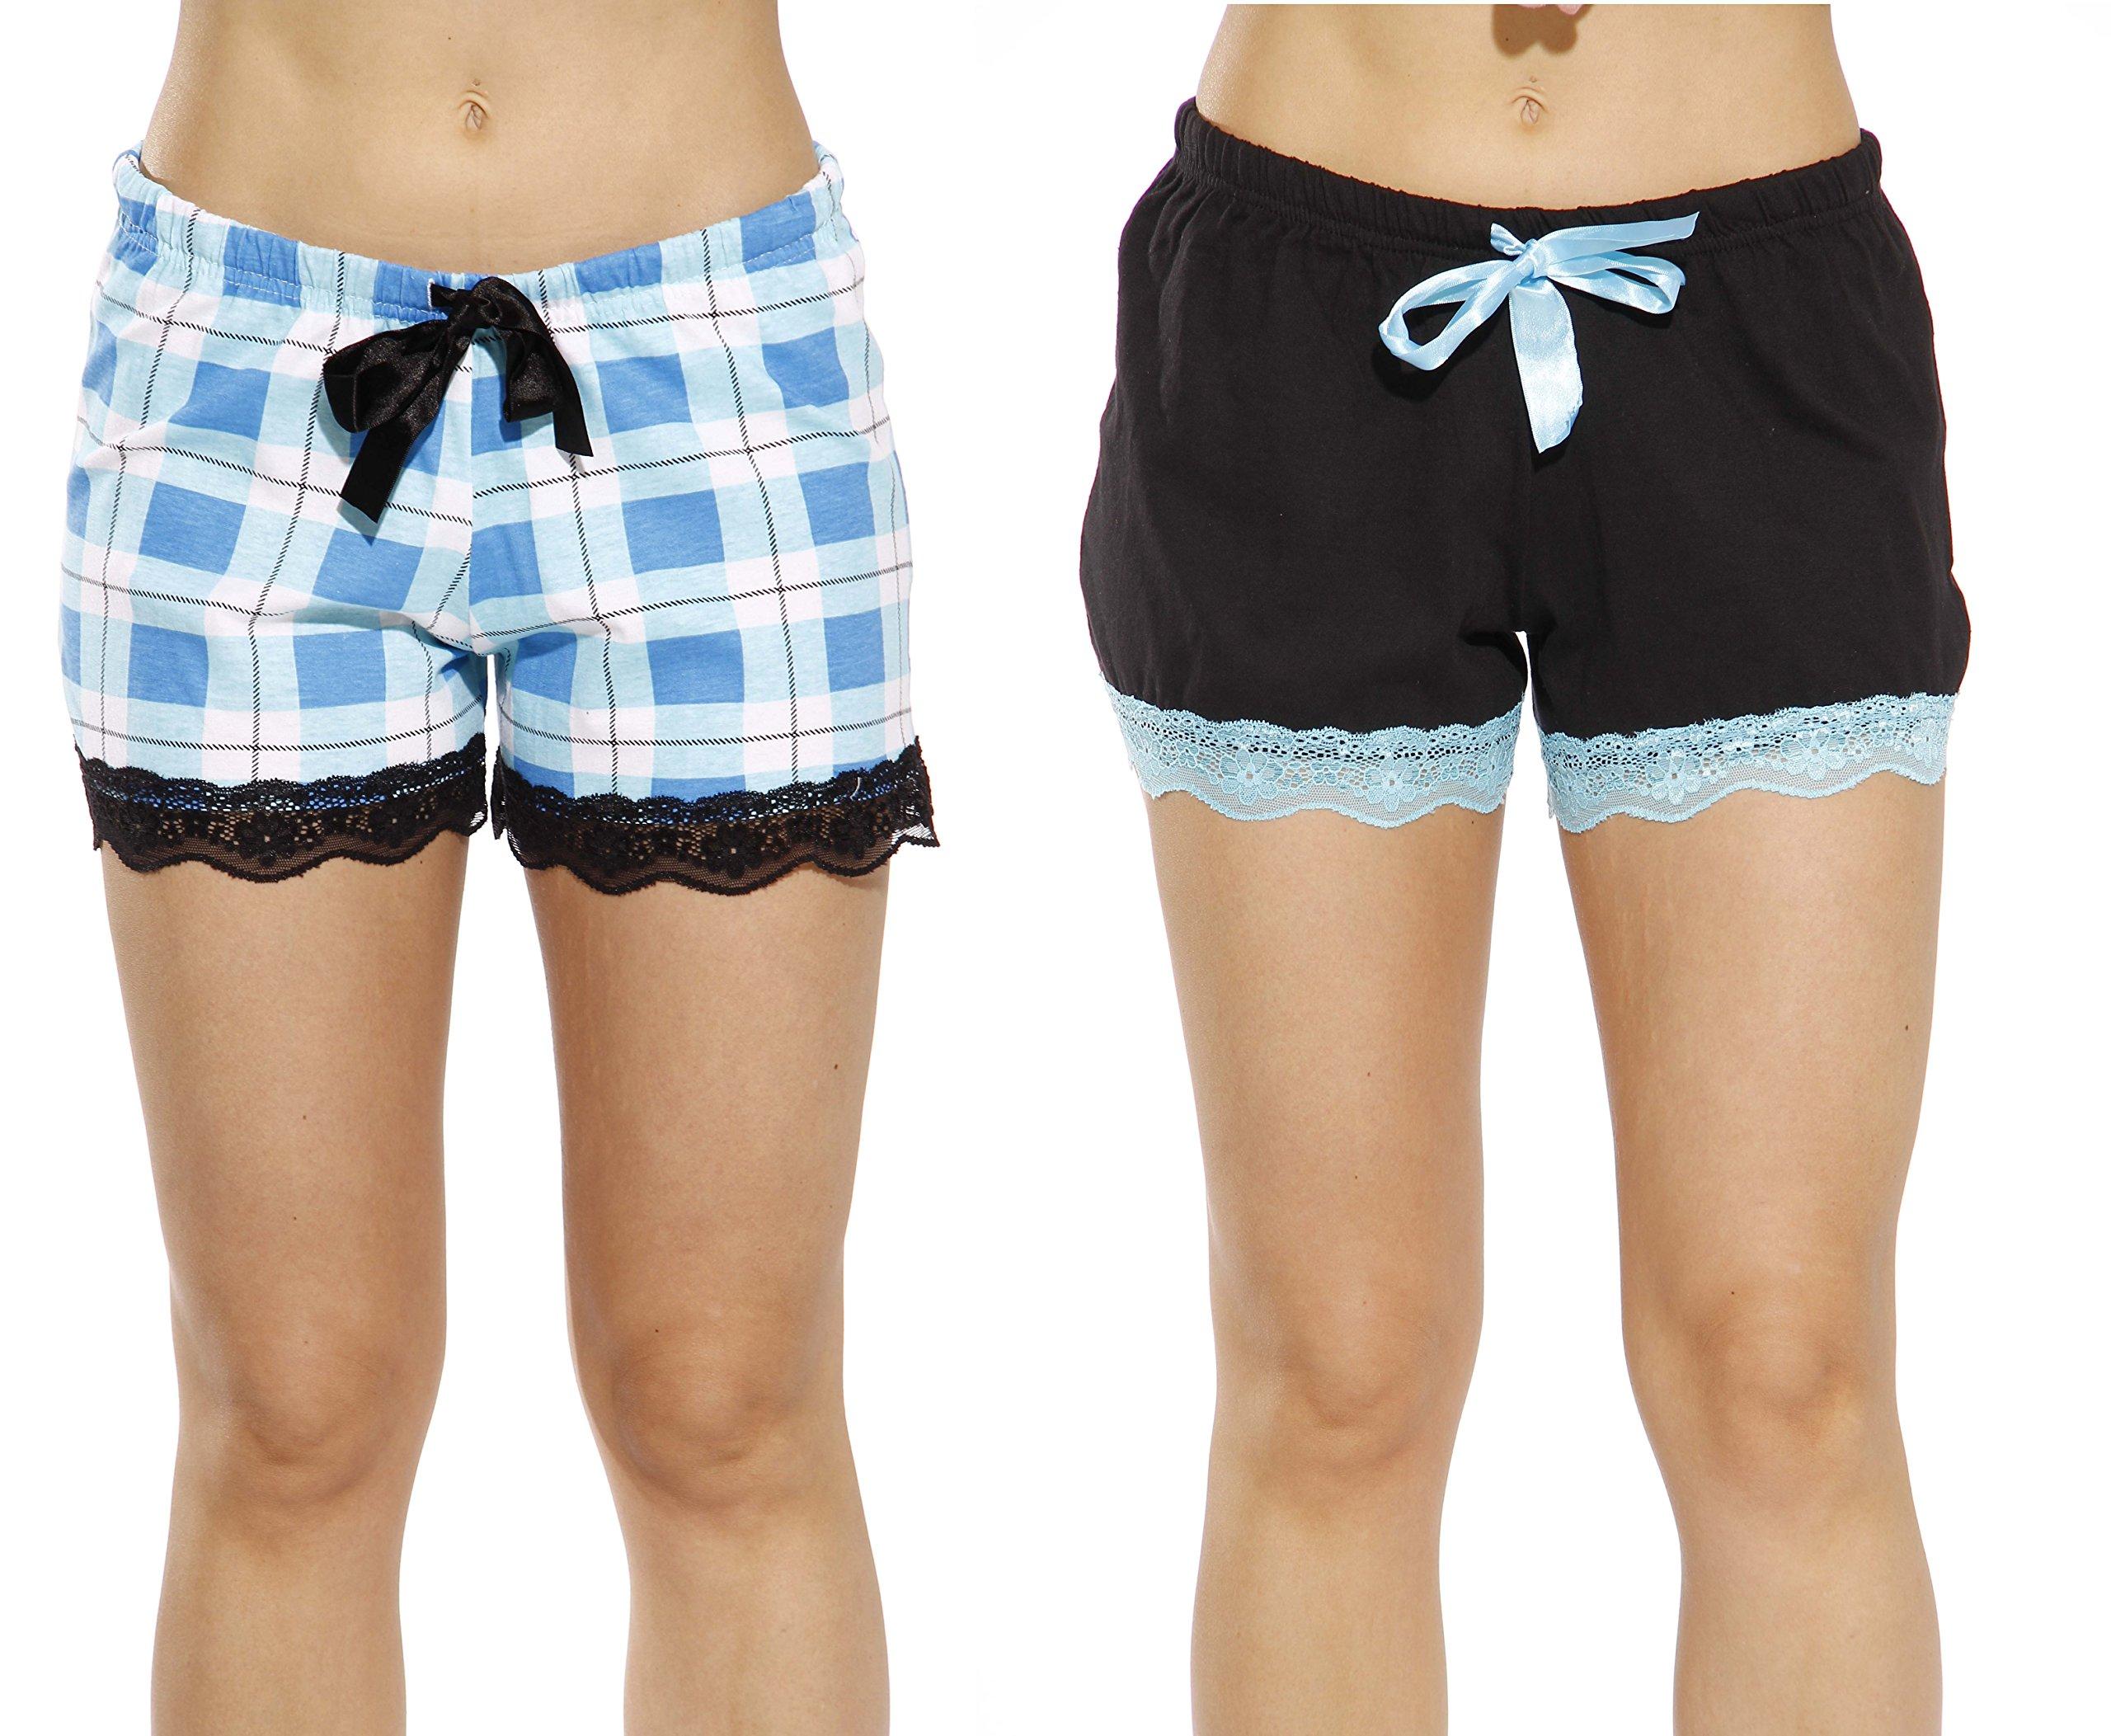 6334-10019-S Just Love Womans Pajamas Shorts - PJs - Sleepwear (Pack of 2),Black - Aqua Plaid (Pack of 2),Small